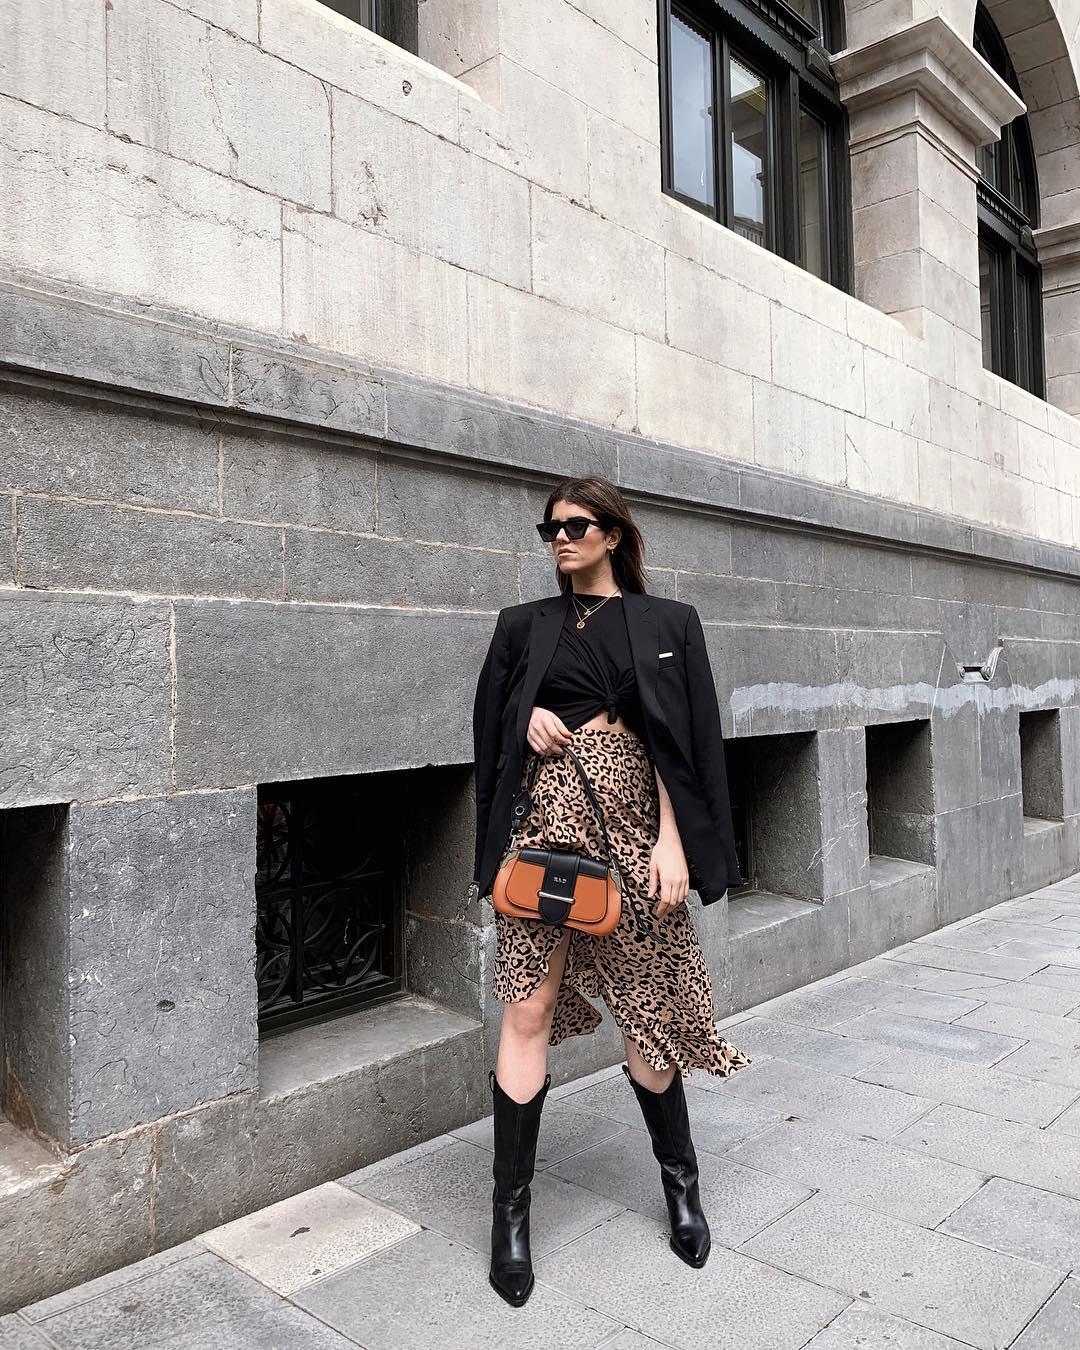 leather boots with cowboy heels de Zara sur carolinabrunelli_